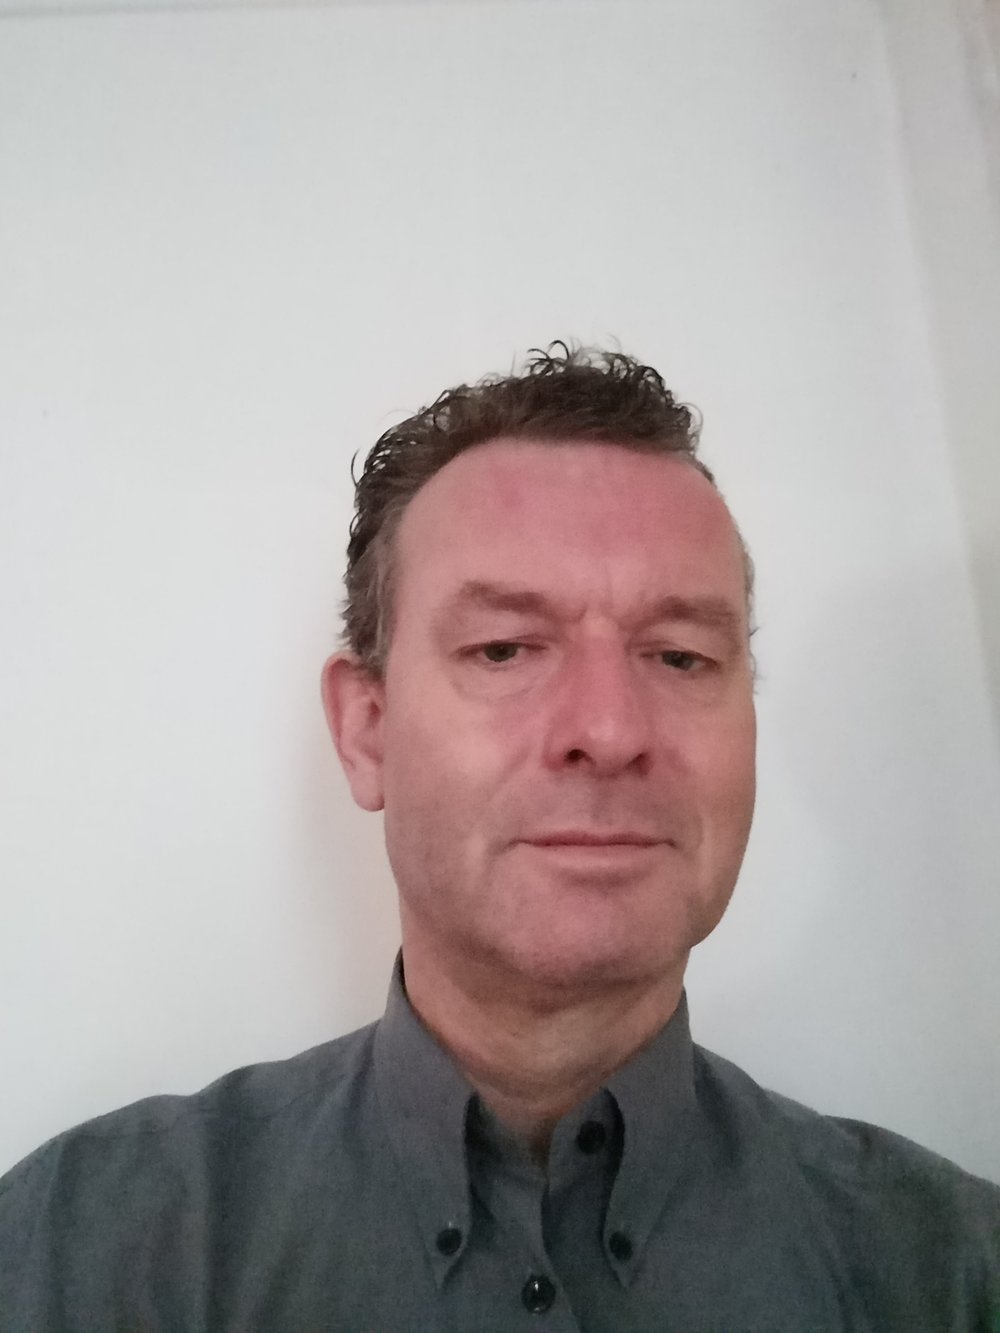 Emile van der Donk